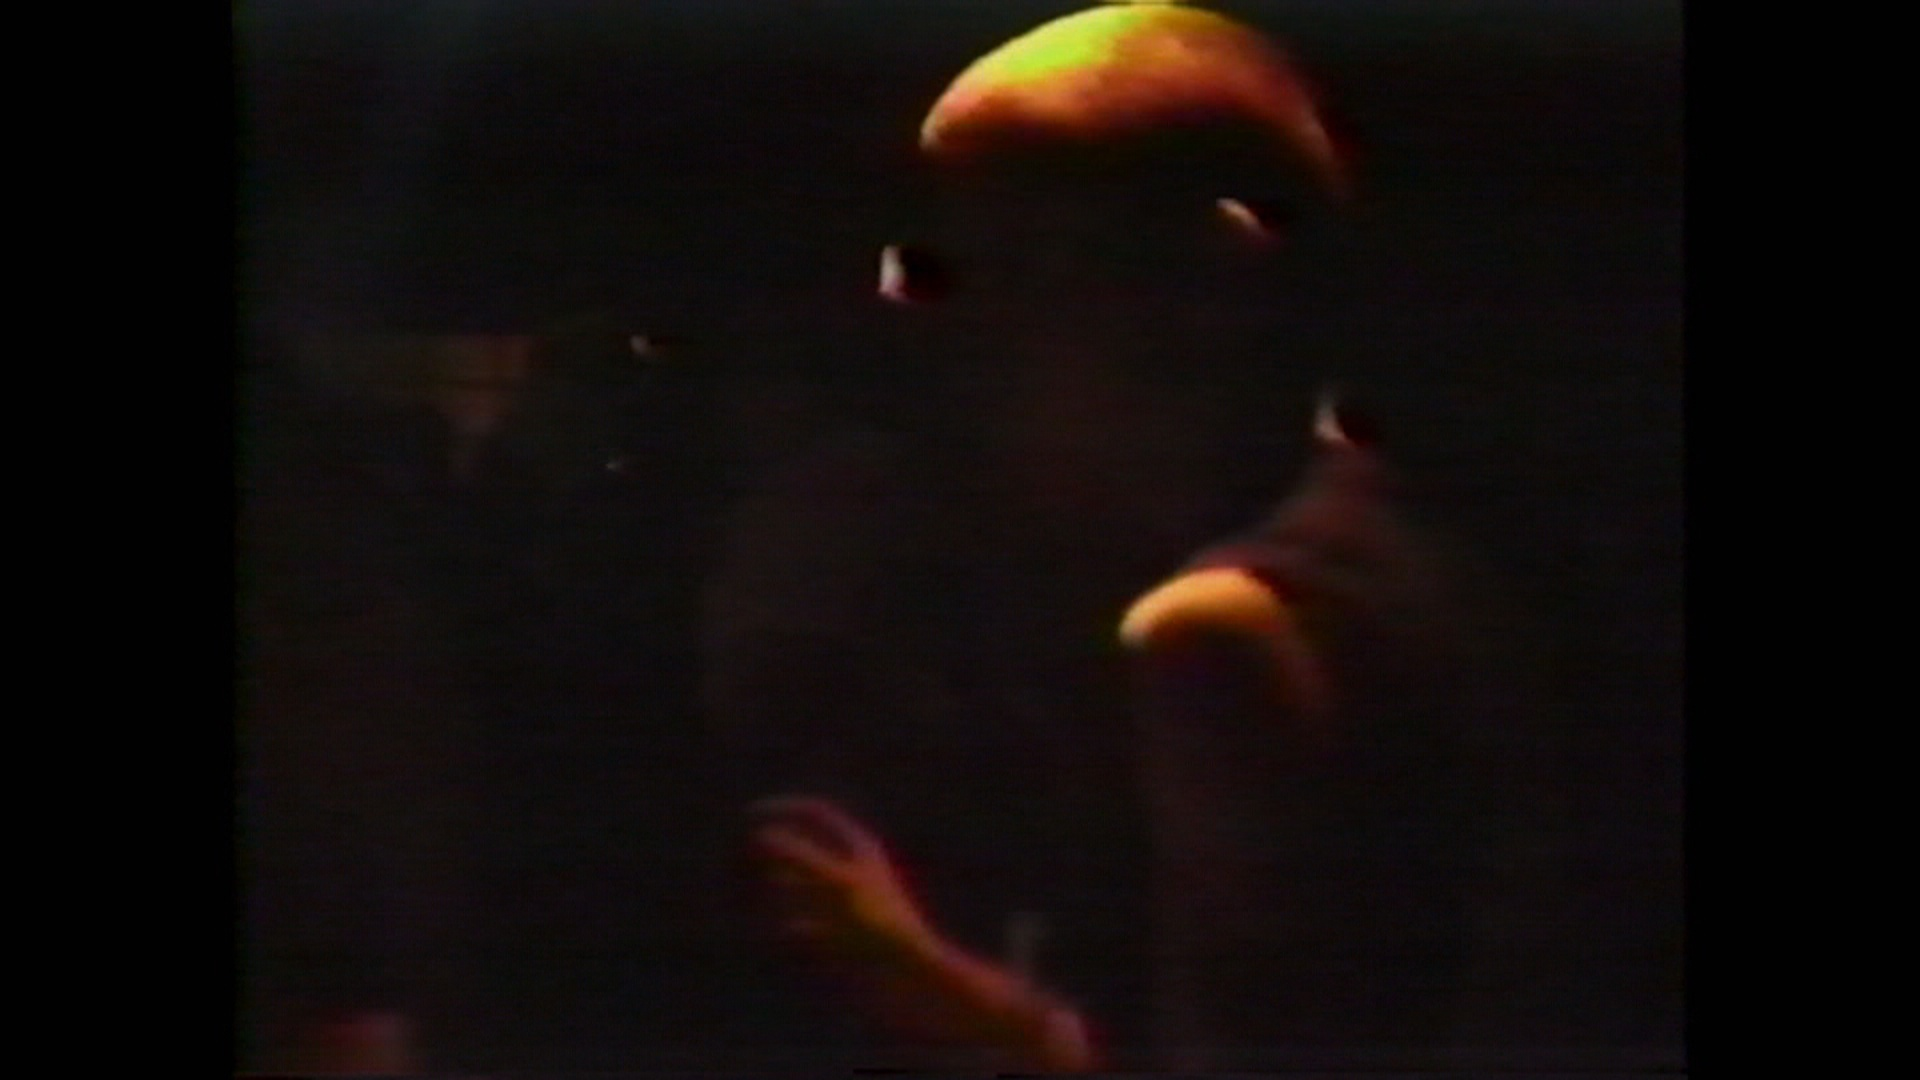 Rohan Quine, 'The Imagination Thief' - film 'KIM 42', still 7